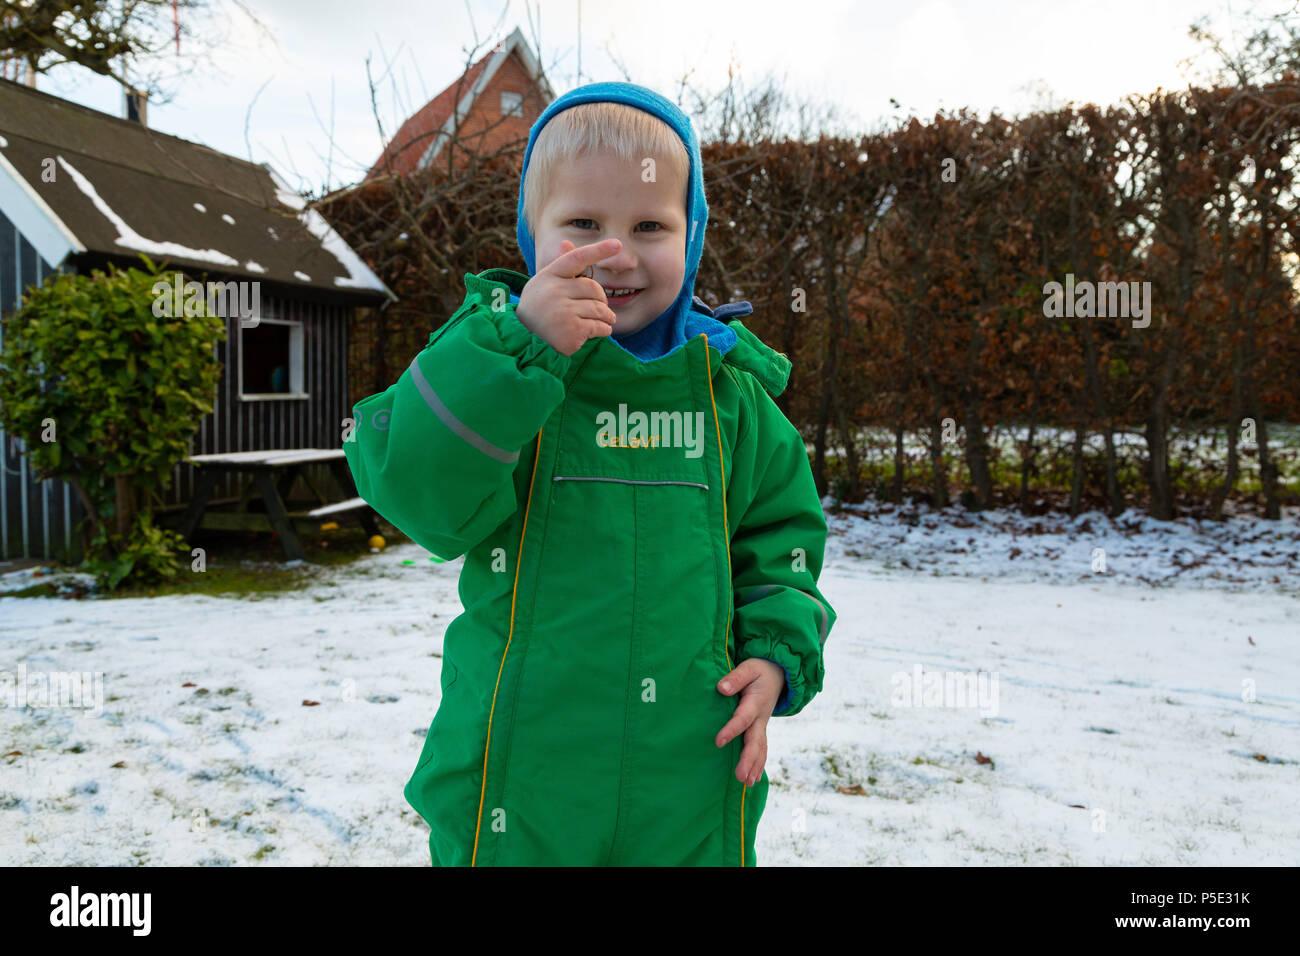 A child playing Barn som leger Ein Kind spielt - Stock Image